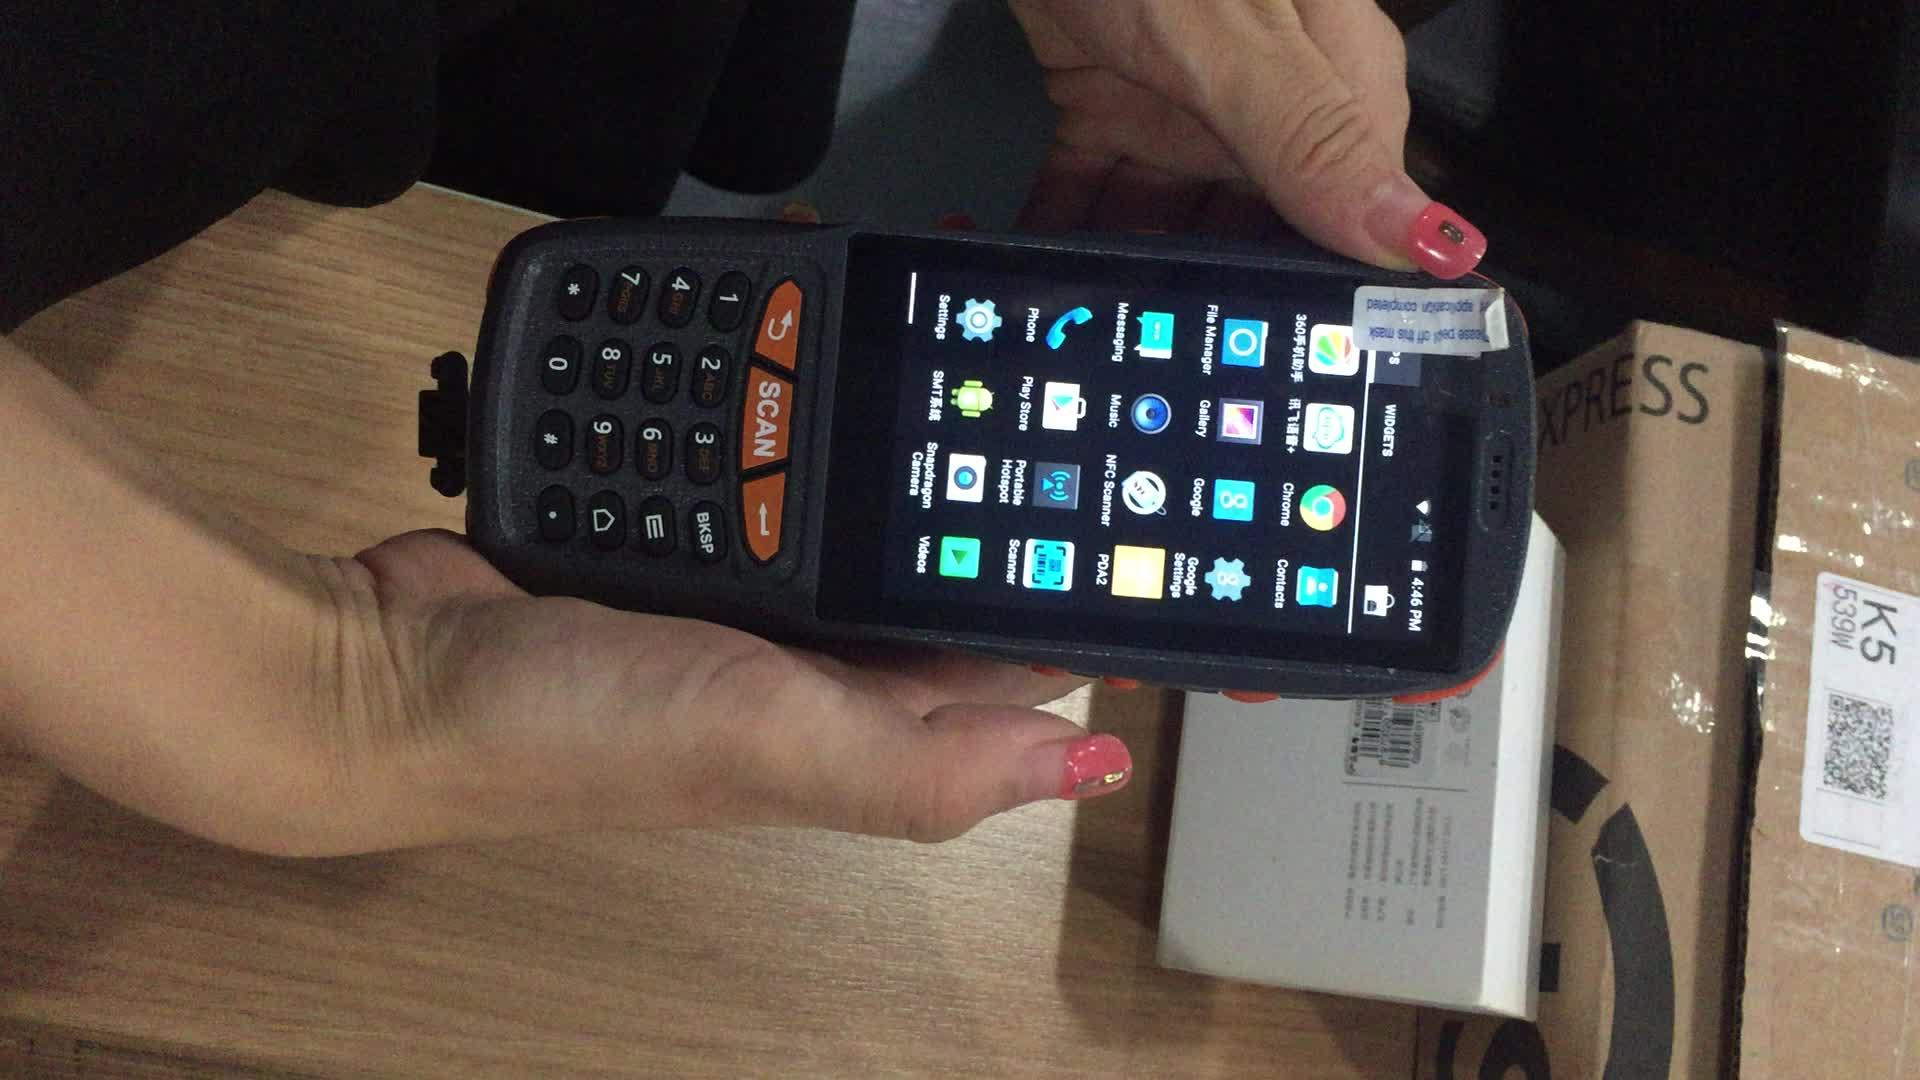 Endüstriyel Sağlam Bluetooth 4G GPS pda wifi el terminali cihazı kablosuz pda barkod tarayıcı android